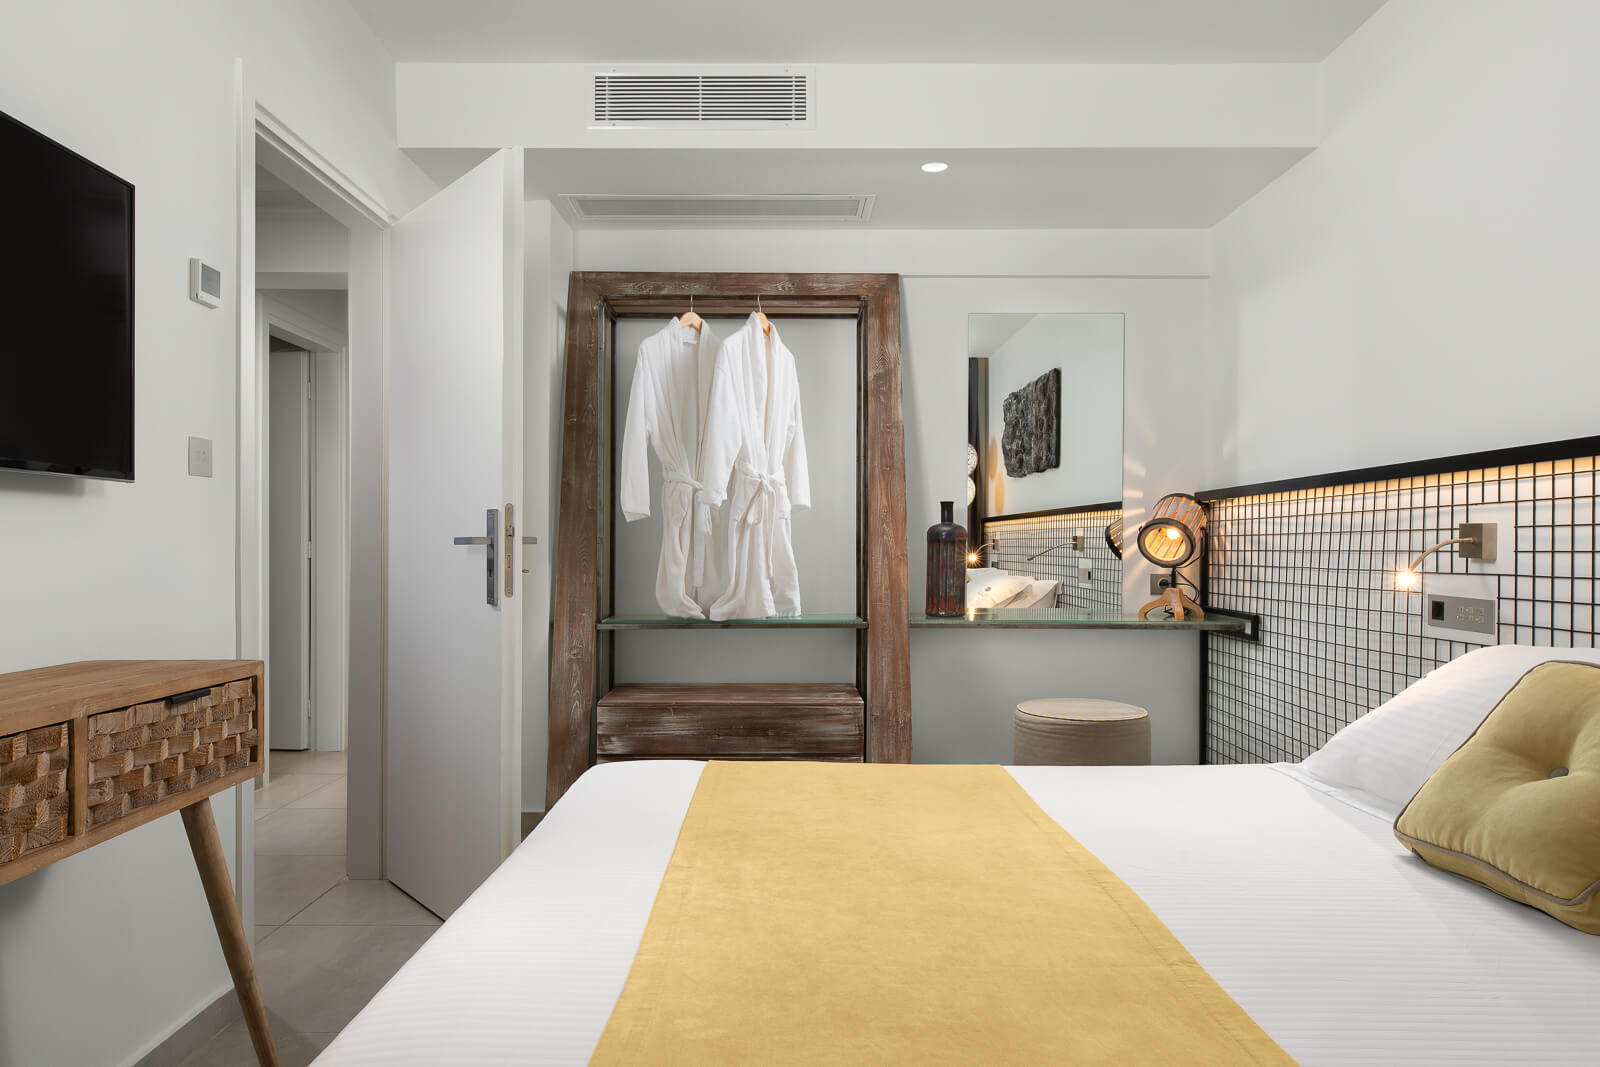 Aspalathos Hotel Room - Elakati Hotel in Rhodes